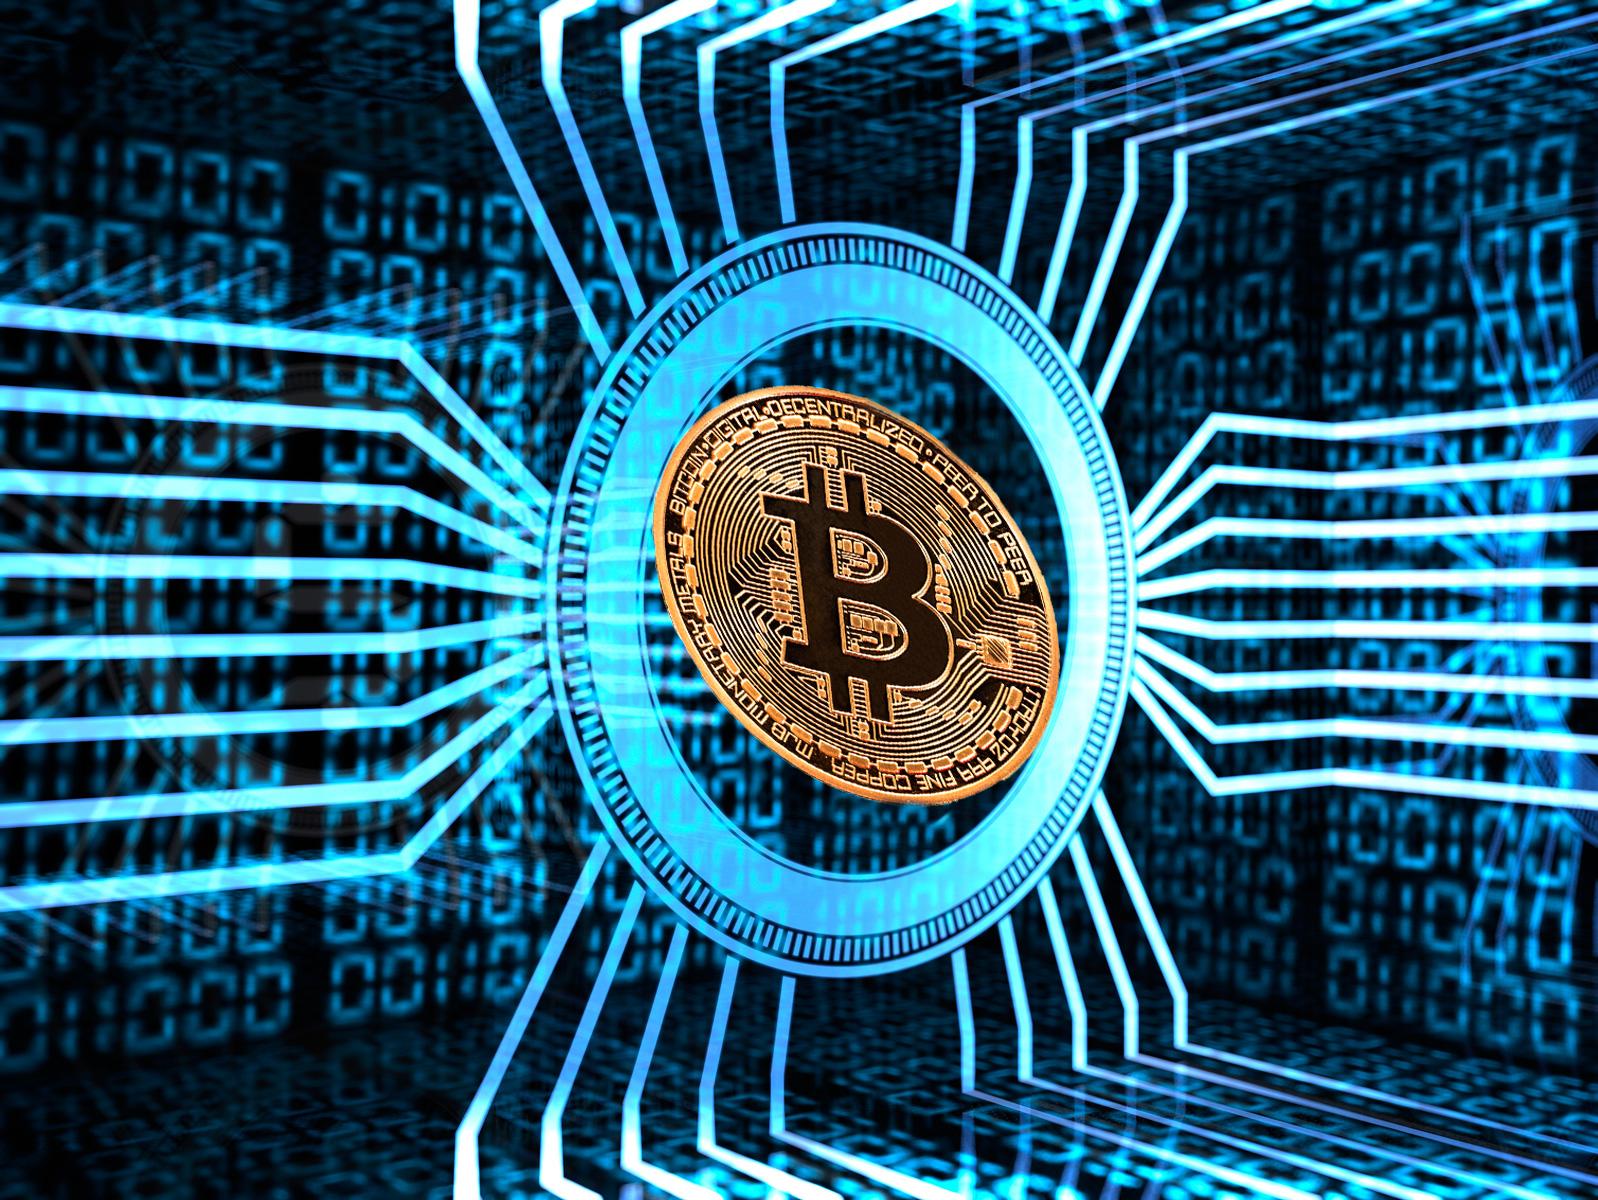 Hacker Iphone Wallpaper Bitcoin Ethereum Ripple Tullett Prebon Information